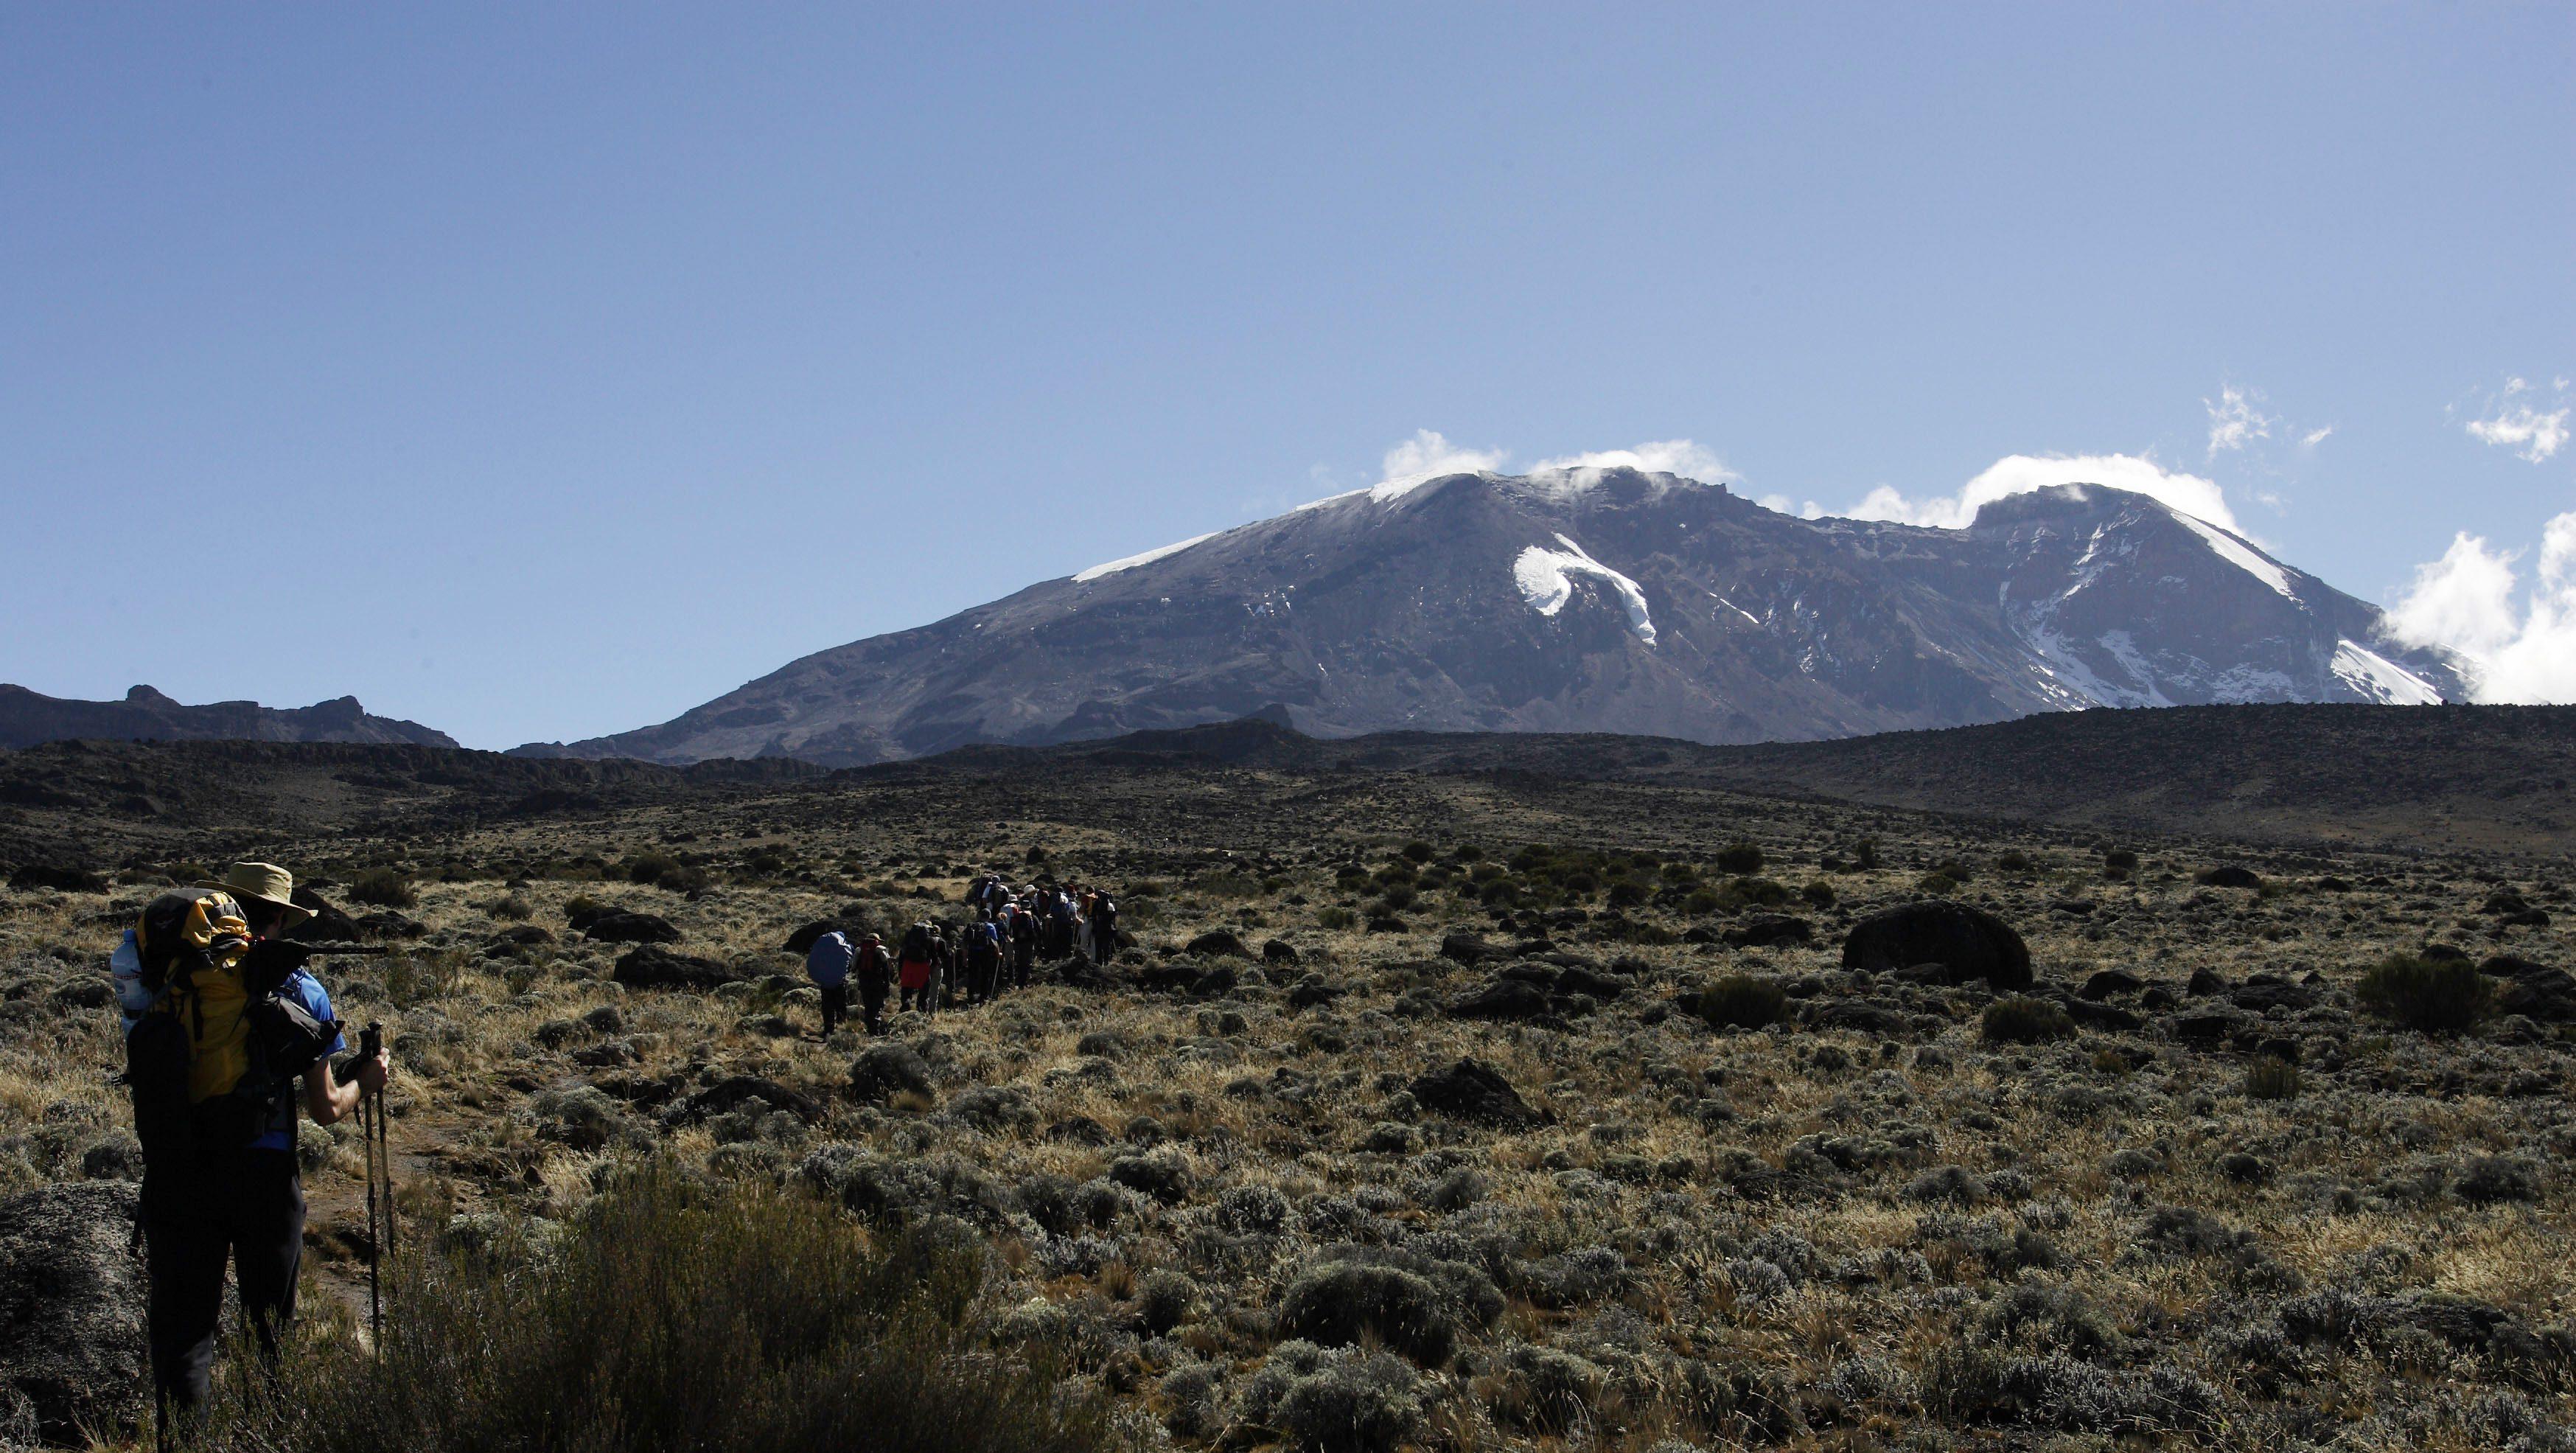 Trekkers cross the Shira Plateau on Tanzania's Mount Kilimanjaro